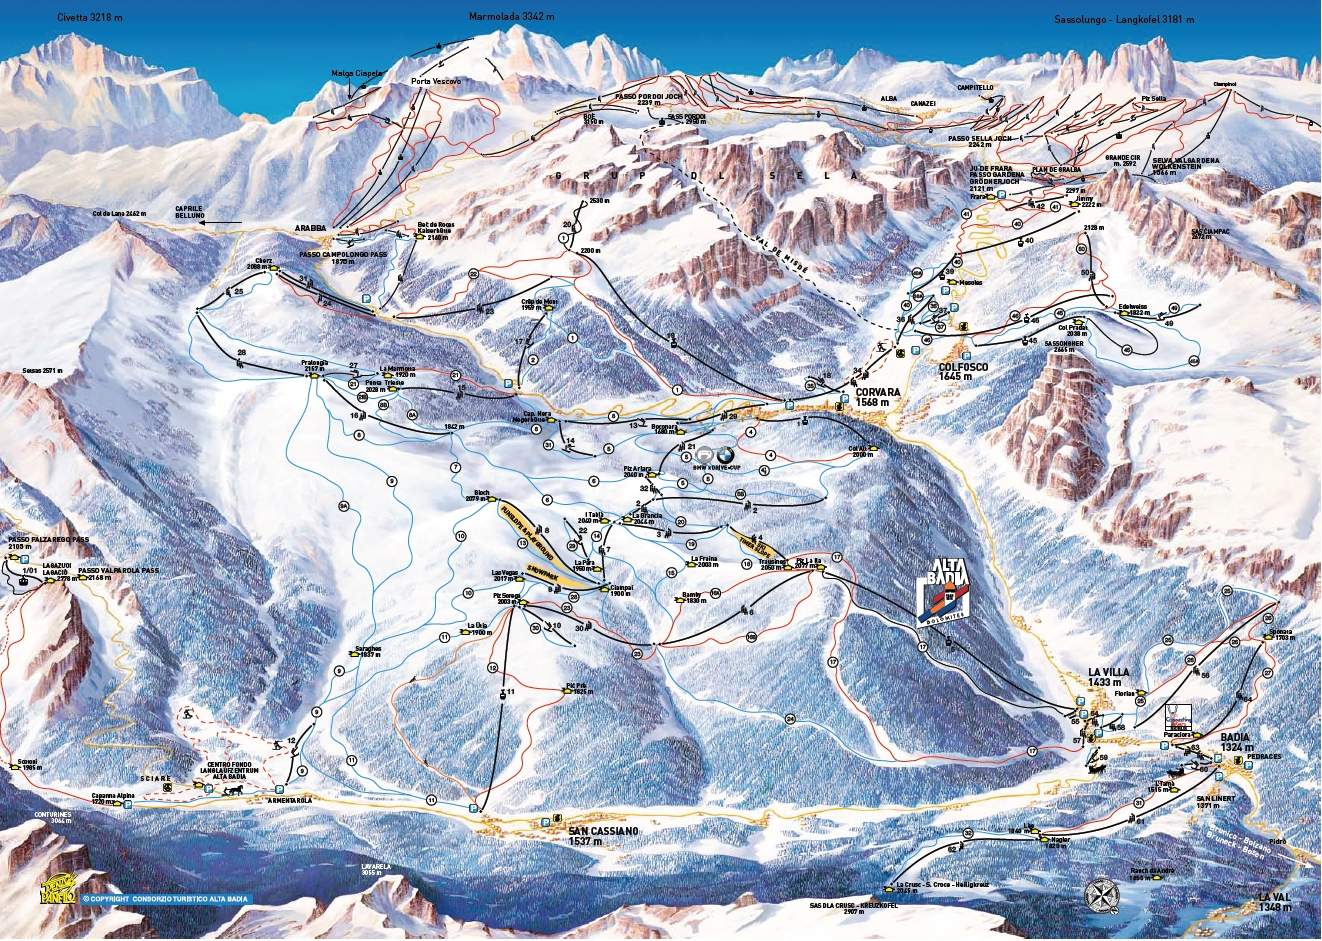 Corvara (Alta Badia) Piste Map / Trail Map